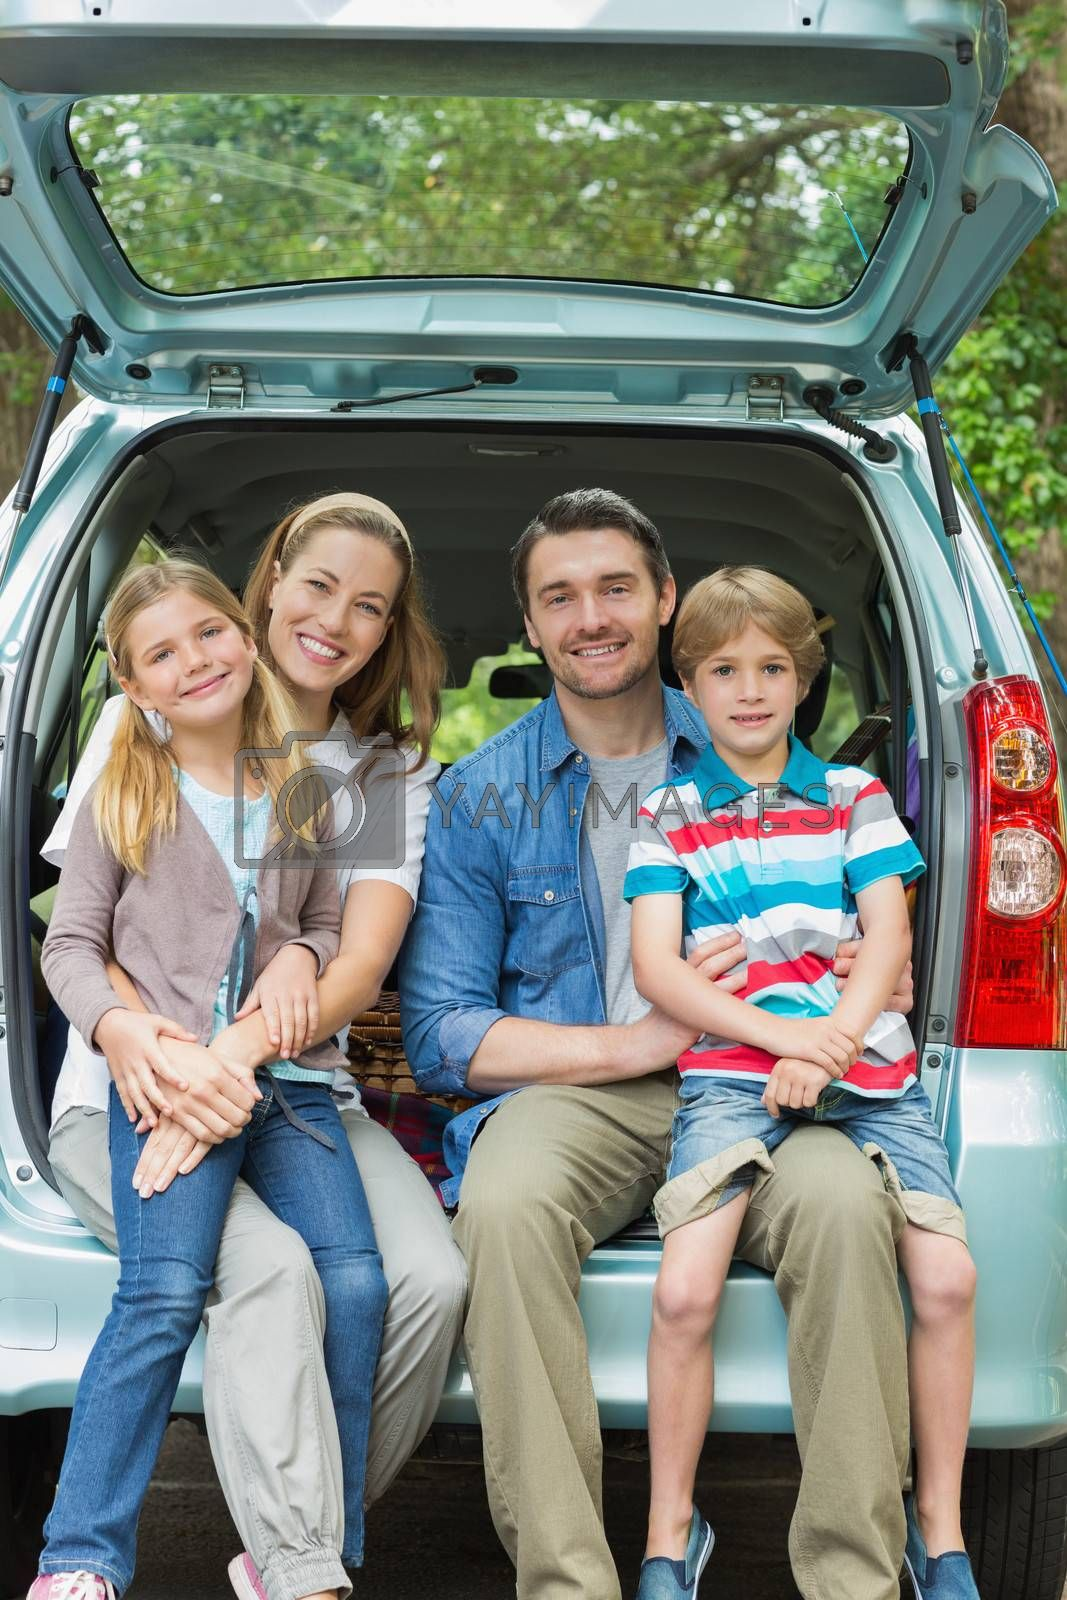 Happy family of four sitting in car trunk by Wavebreakmedia